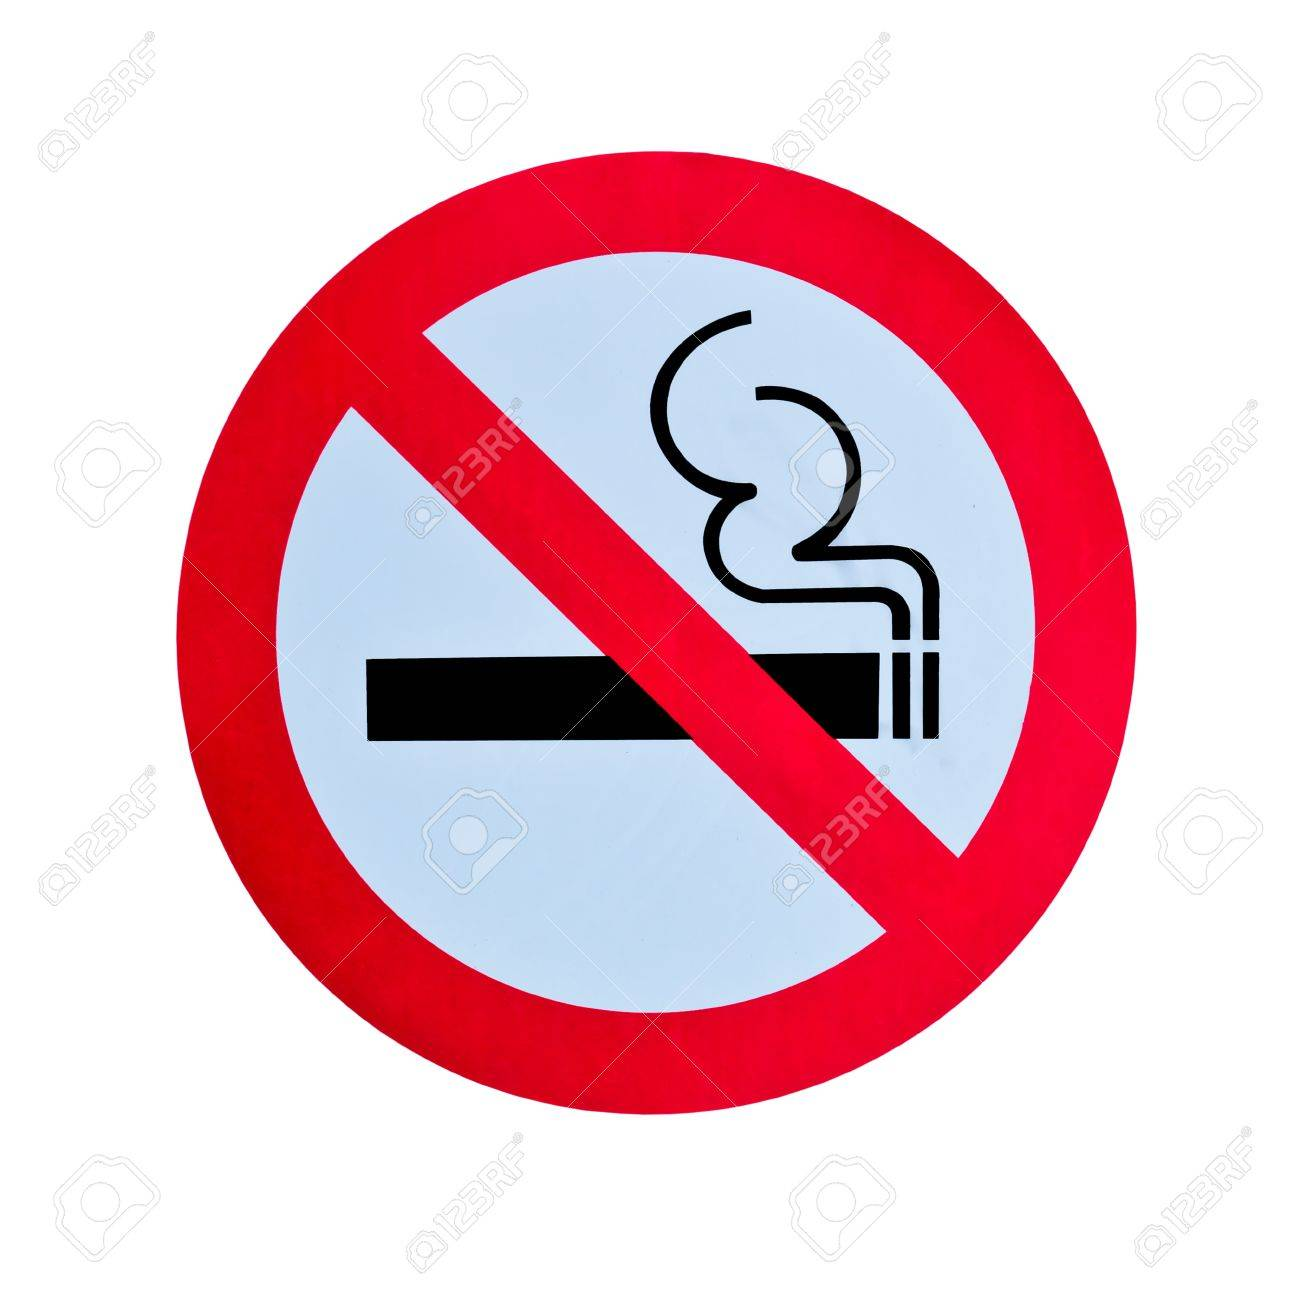 no smoking warning sign isolated Stock Photo - 8385854